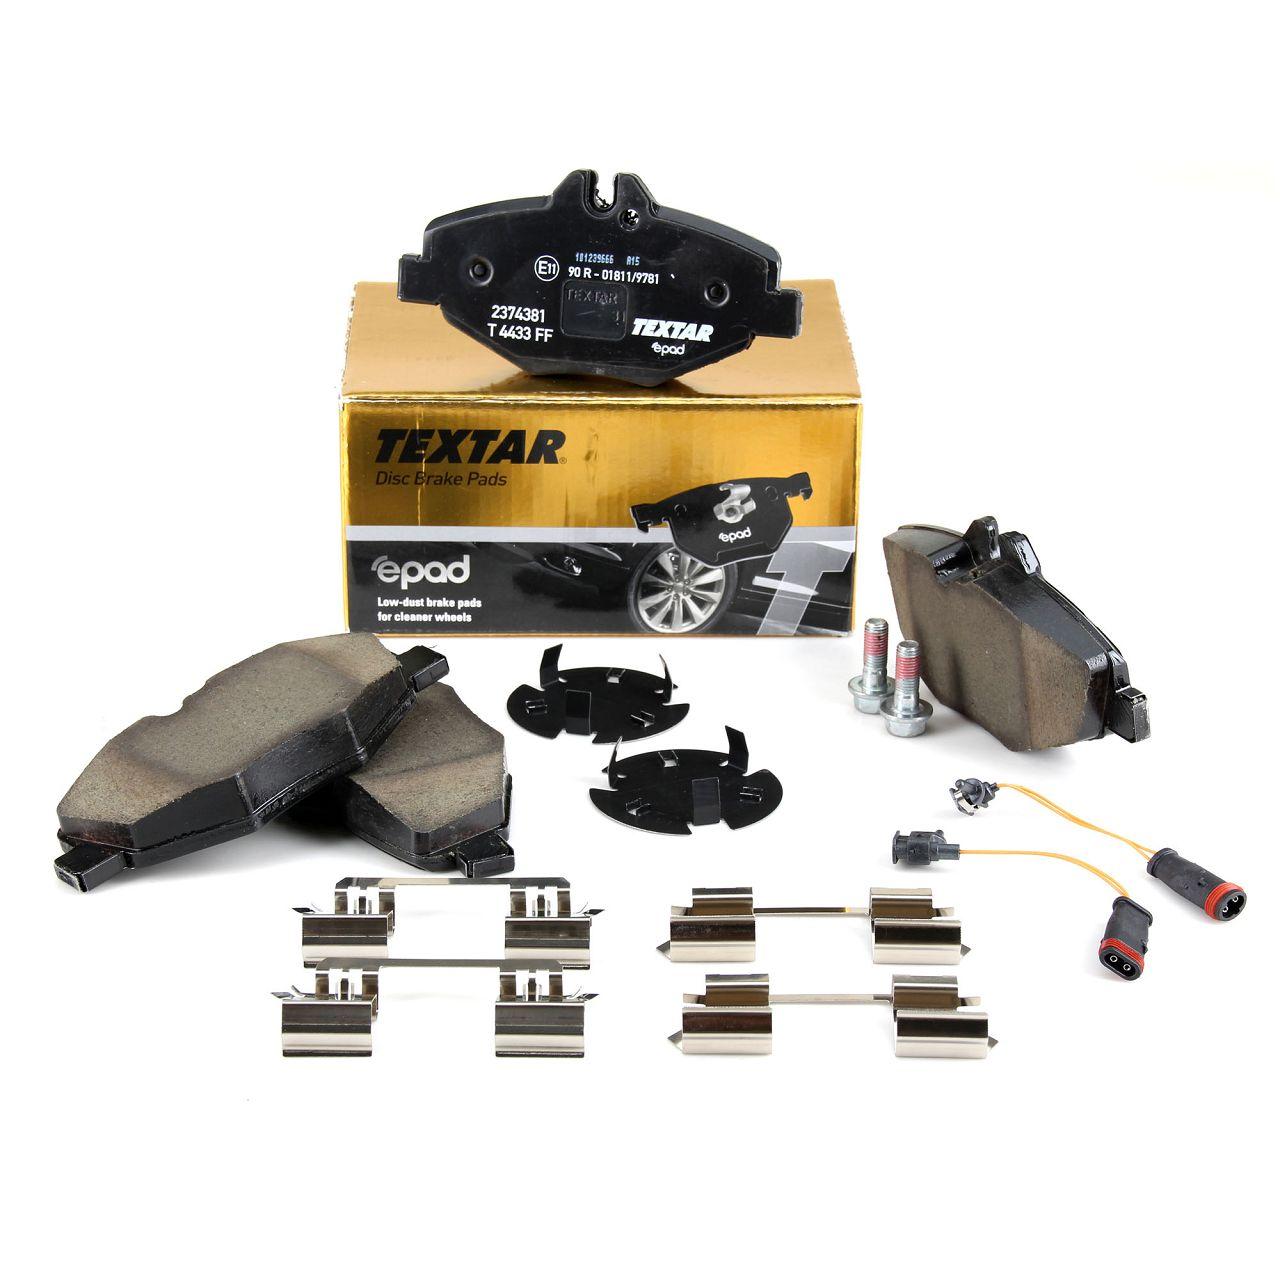 TEXTAR 2374381 epad Bremsbeläge + Wako MERCEDES E-Klasse W211 S211 vorne